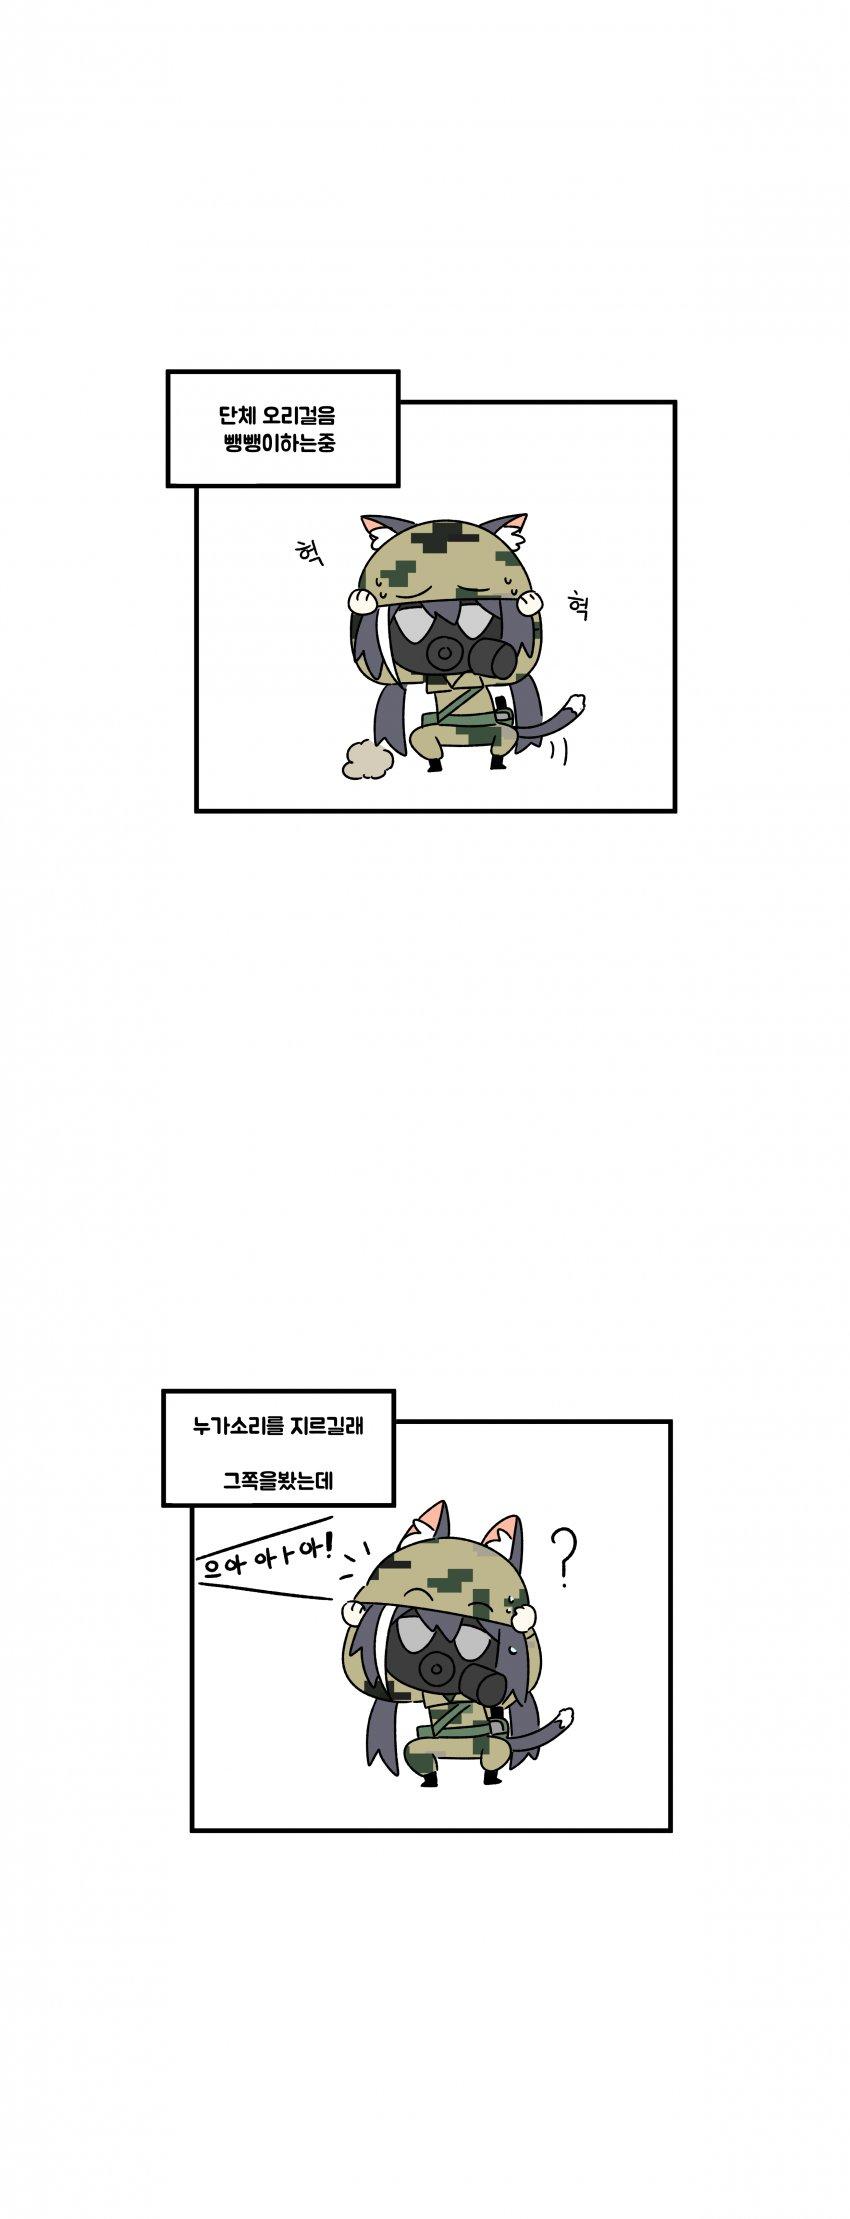 viewimage.php?no=24b0d769e1d32ca73fec81fa11d02831b46f6c3837711f4400726c62de63225a12b23d929cca3b1cce87fdc59da7b6dd2efb5c8509352bf6e251daa7d1eeef146abee9775fc92cc1941a5ad470cece148d92b32f8fa8b569f037b8557f0a33aa8b270b25